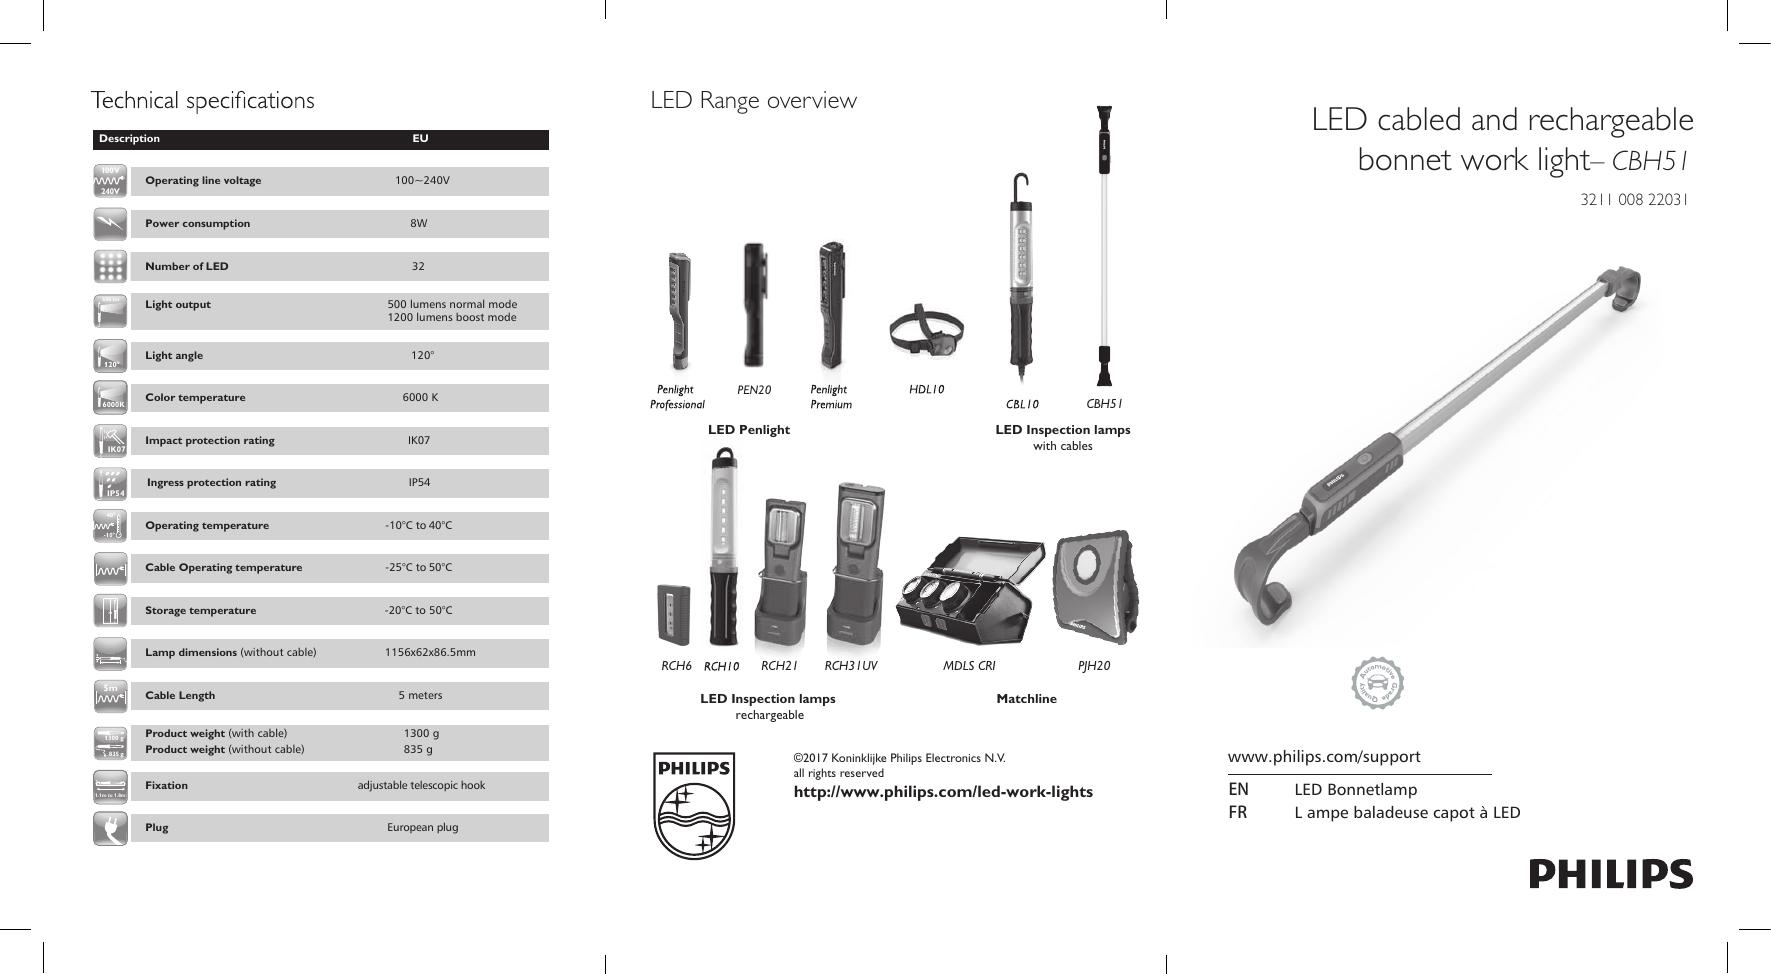 LED Professional Work Light CBH51 Hybrid Aluminium Bonnet Lamp PHILIPS LPL45X1